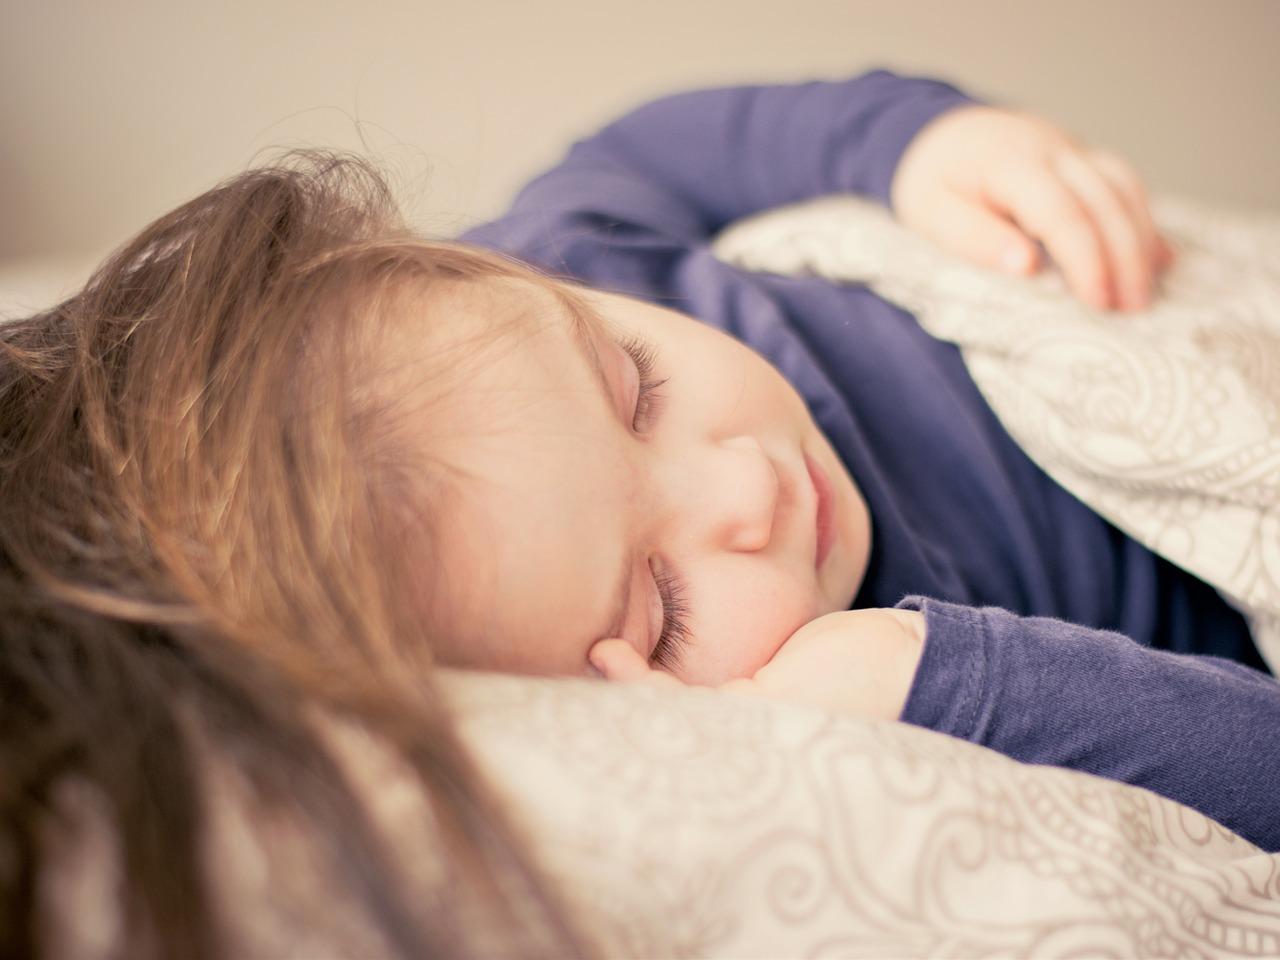 En jente sover søtt på siden, med hånden under hodet, under en dyne.